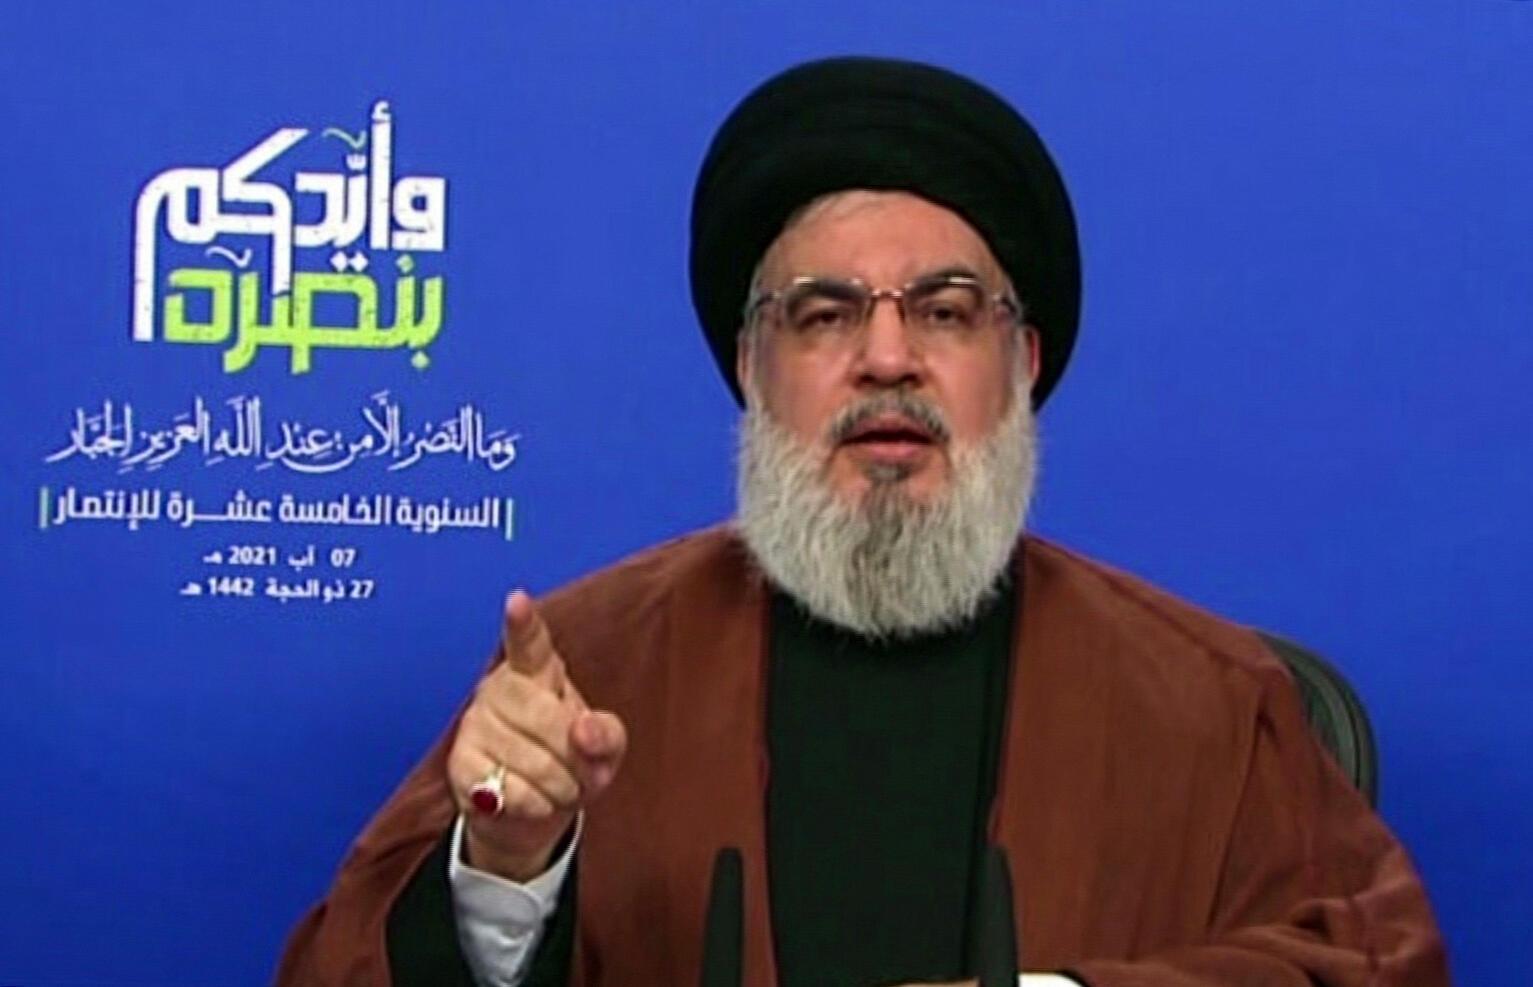 Hezbollah leader Hassan Nasrallah described the air strikes this week as a 'very dangerous development', but said Hezbollah did not want war